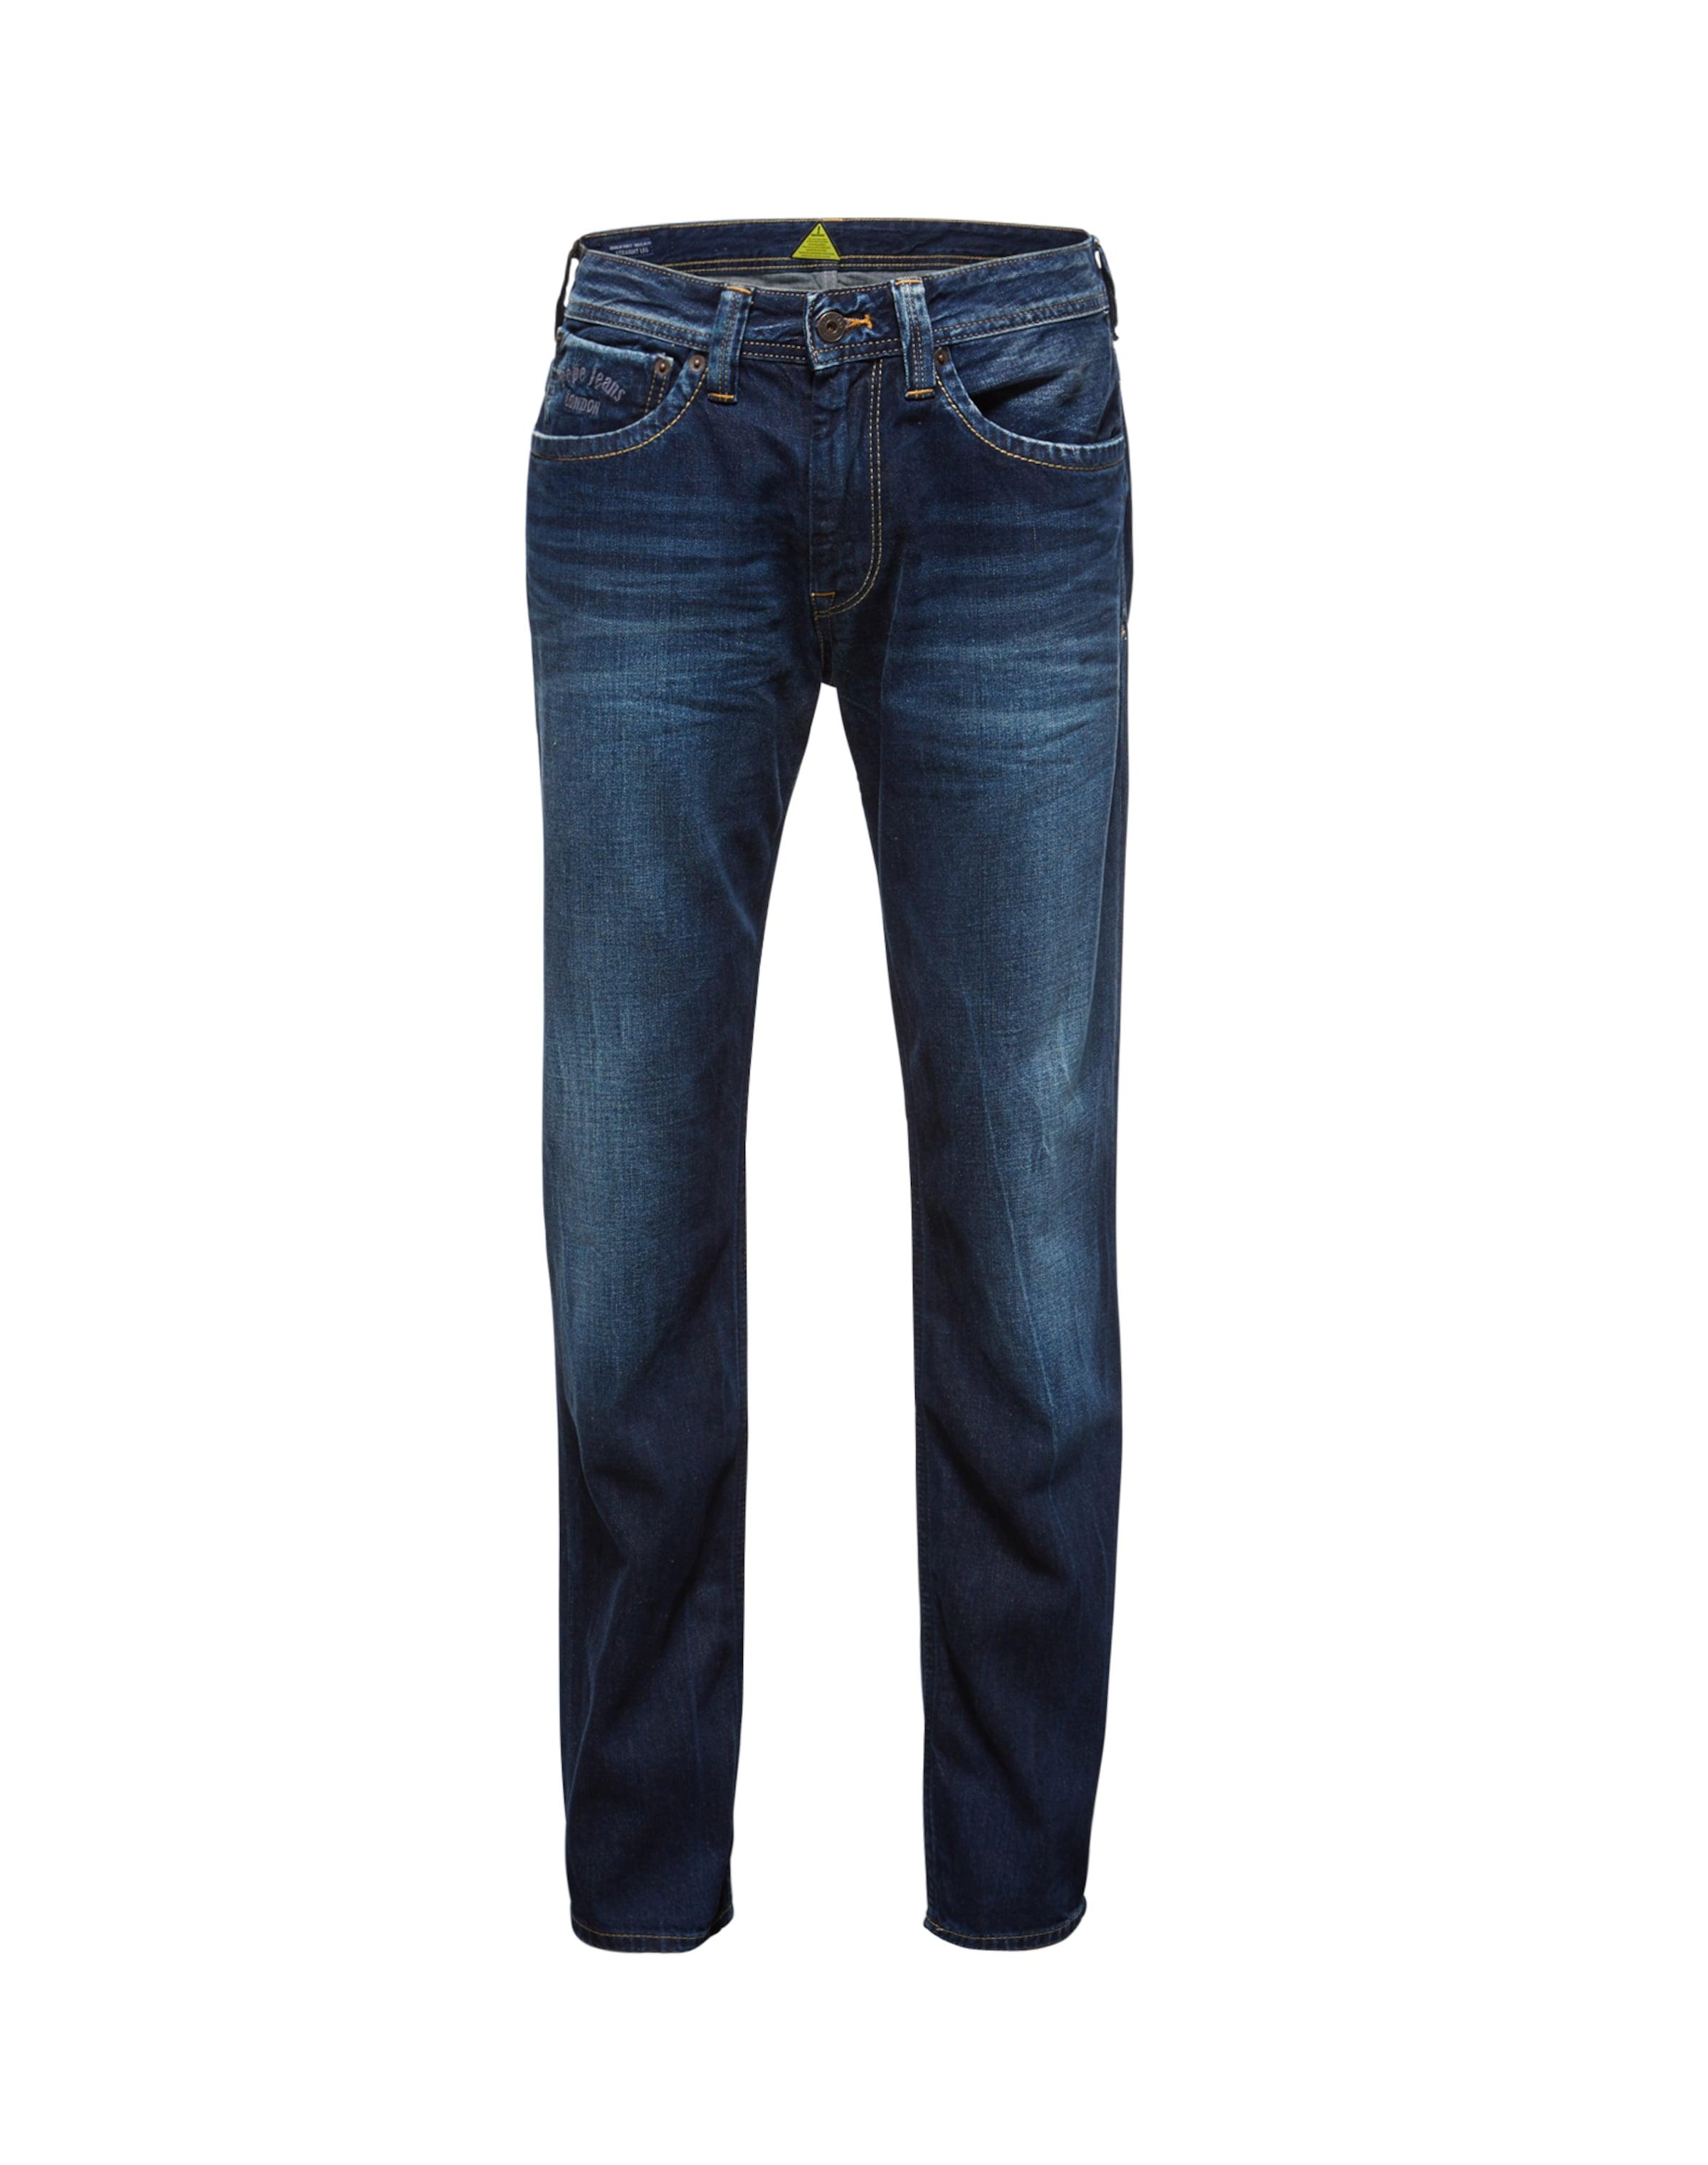 Pepe In Blue Blue Jeans In Denim Jeans Pepe Pepe Denim XuOZTPki